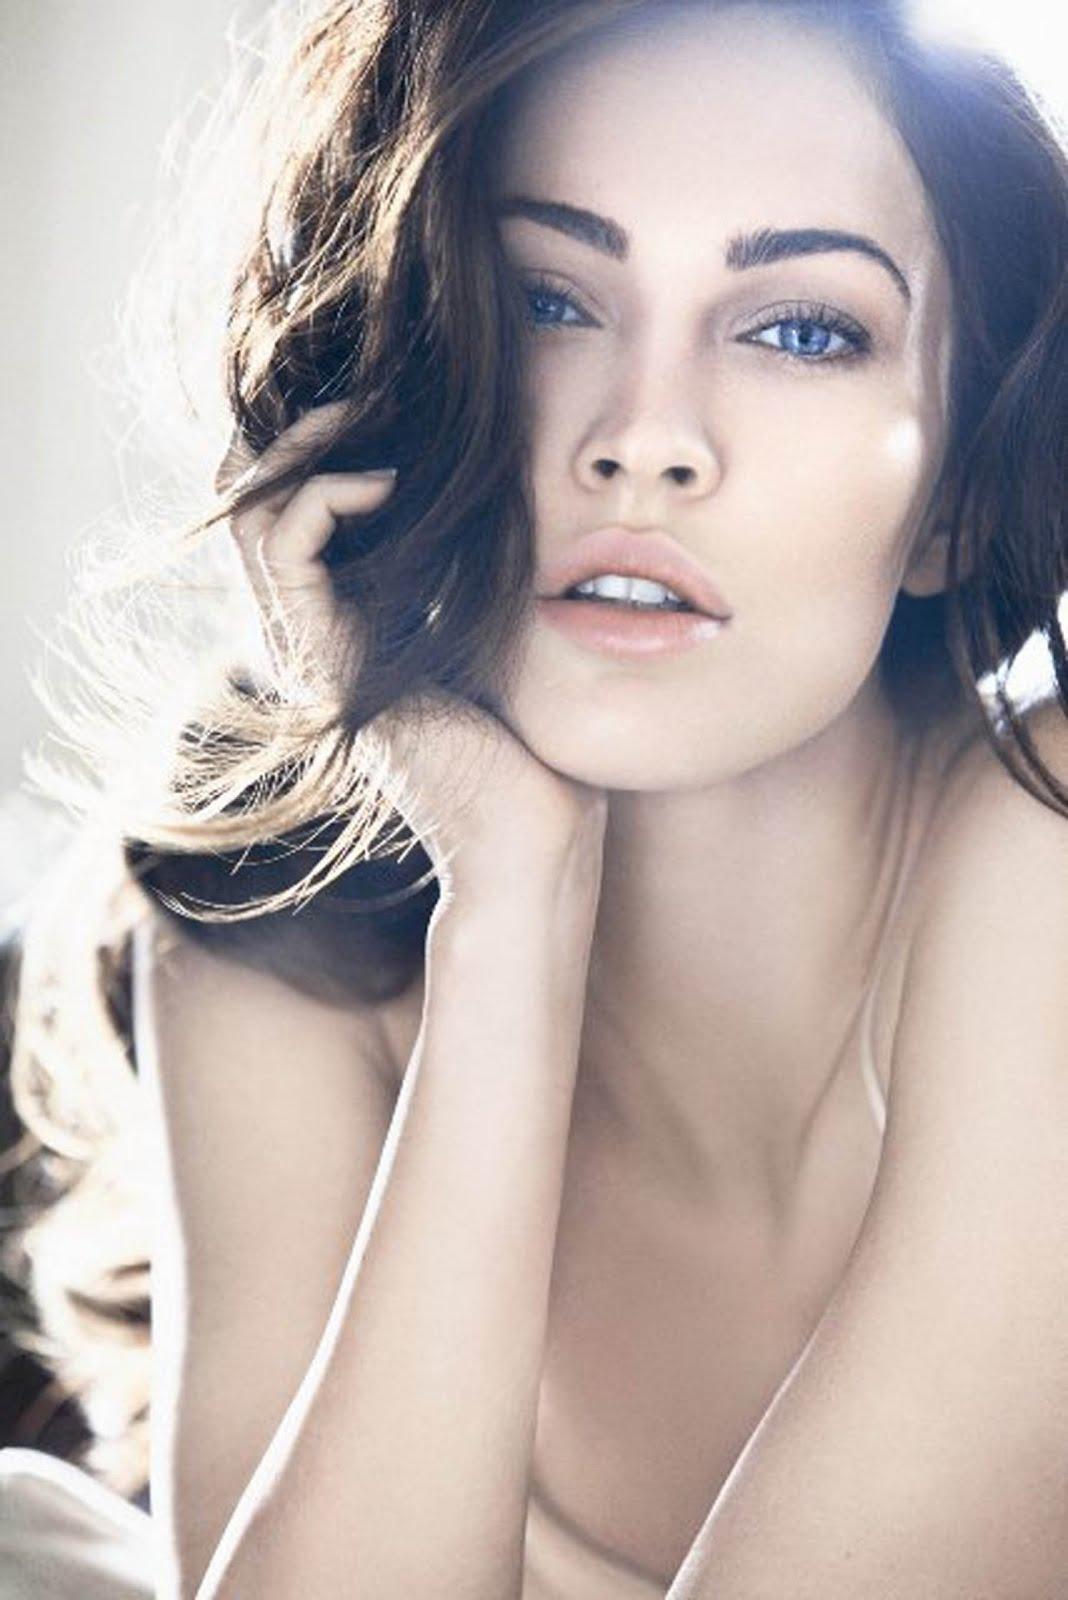 http://4.bp.blogspot.com/-eRBbgawF_KE/T2-LYObC2QI/AAAAAAAAQC8/-_EumrF3ya4/s1600/megan-fox-%2Bgiorgio-armani-beauty-ad-campaign-%2B%25285%2529.jpg